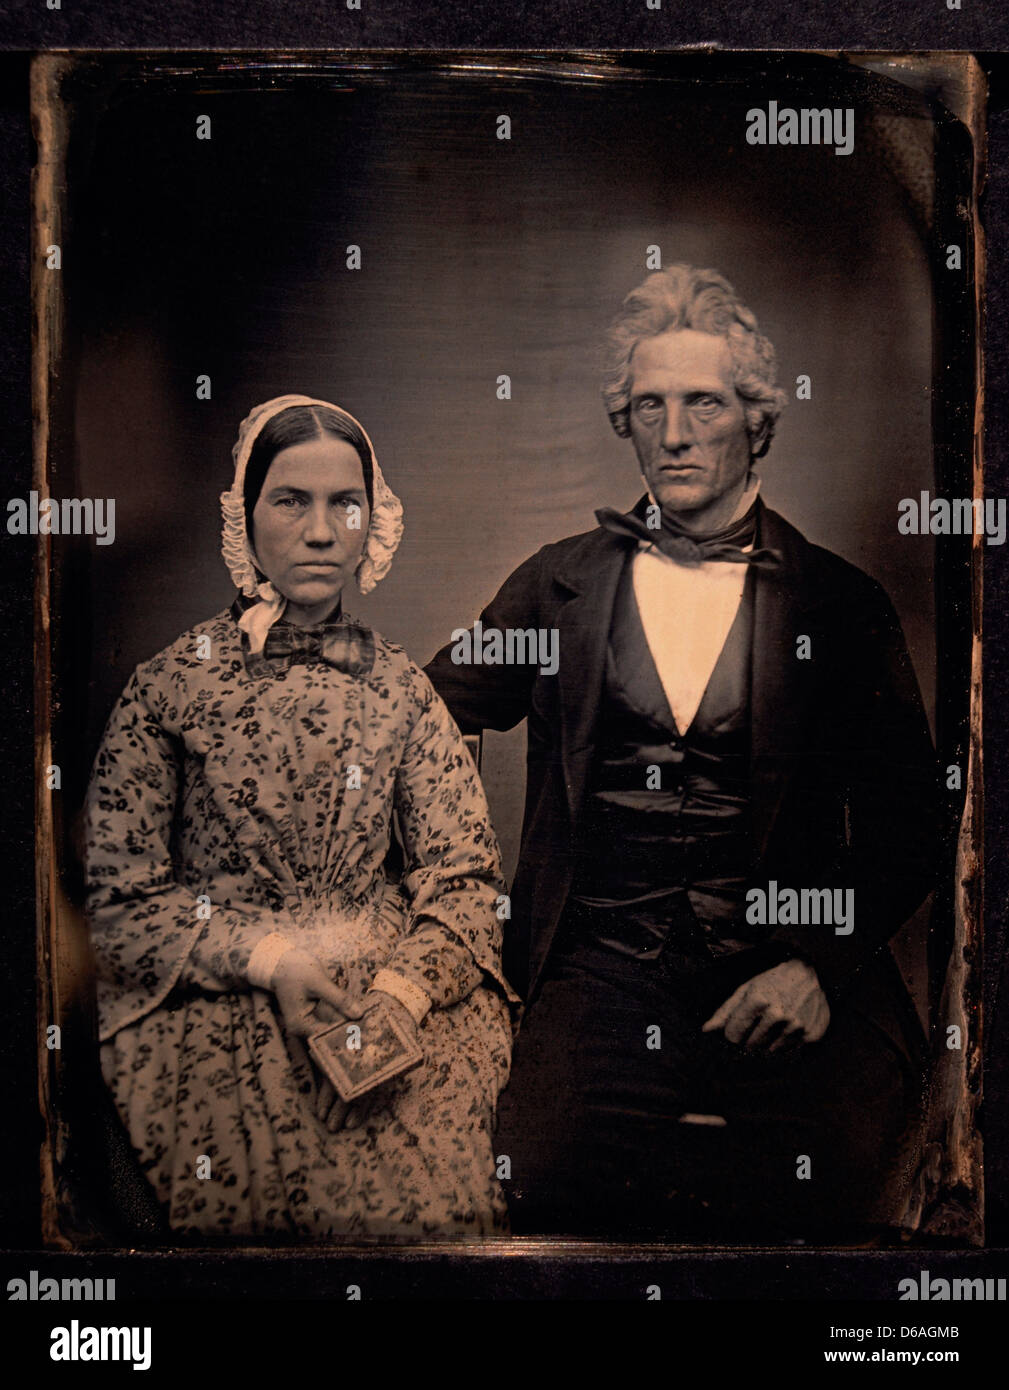 Par de retrato, daguerrotipo, circa 1850 Imagen De Stock